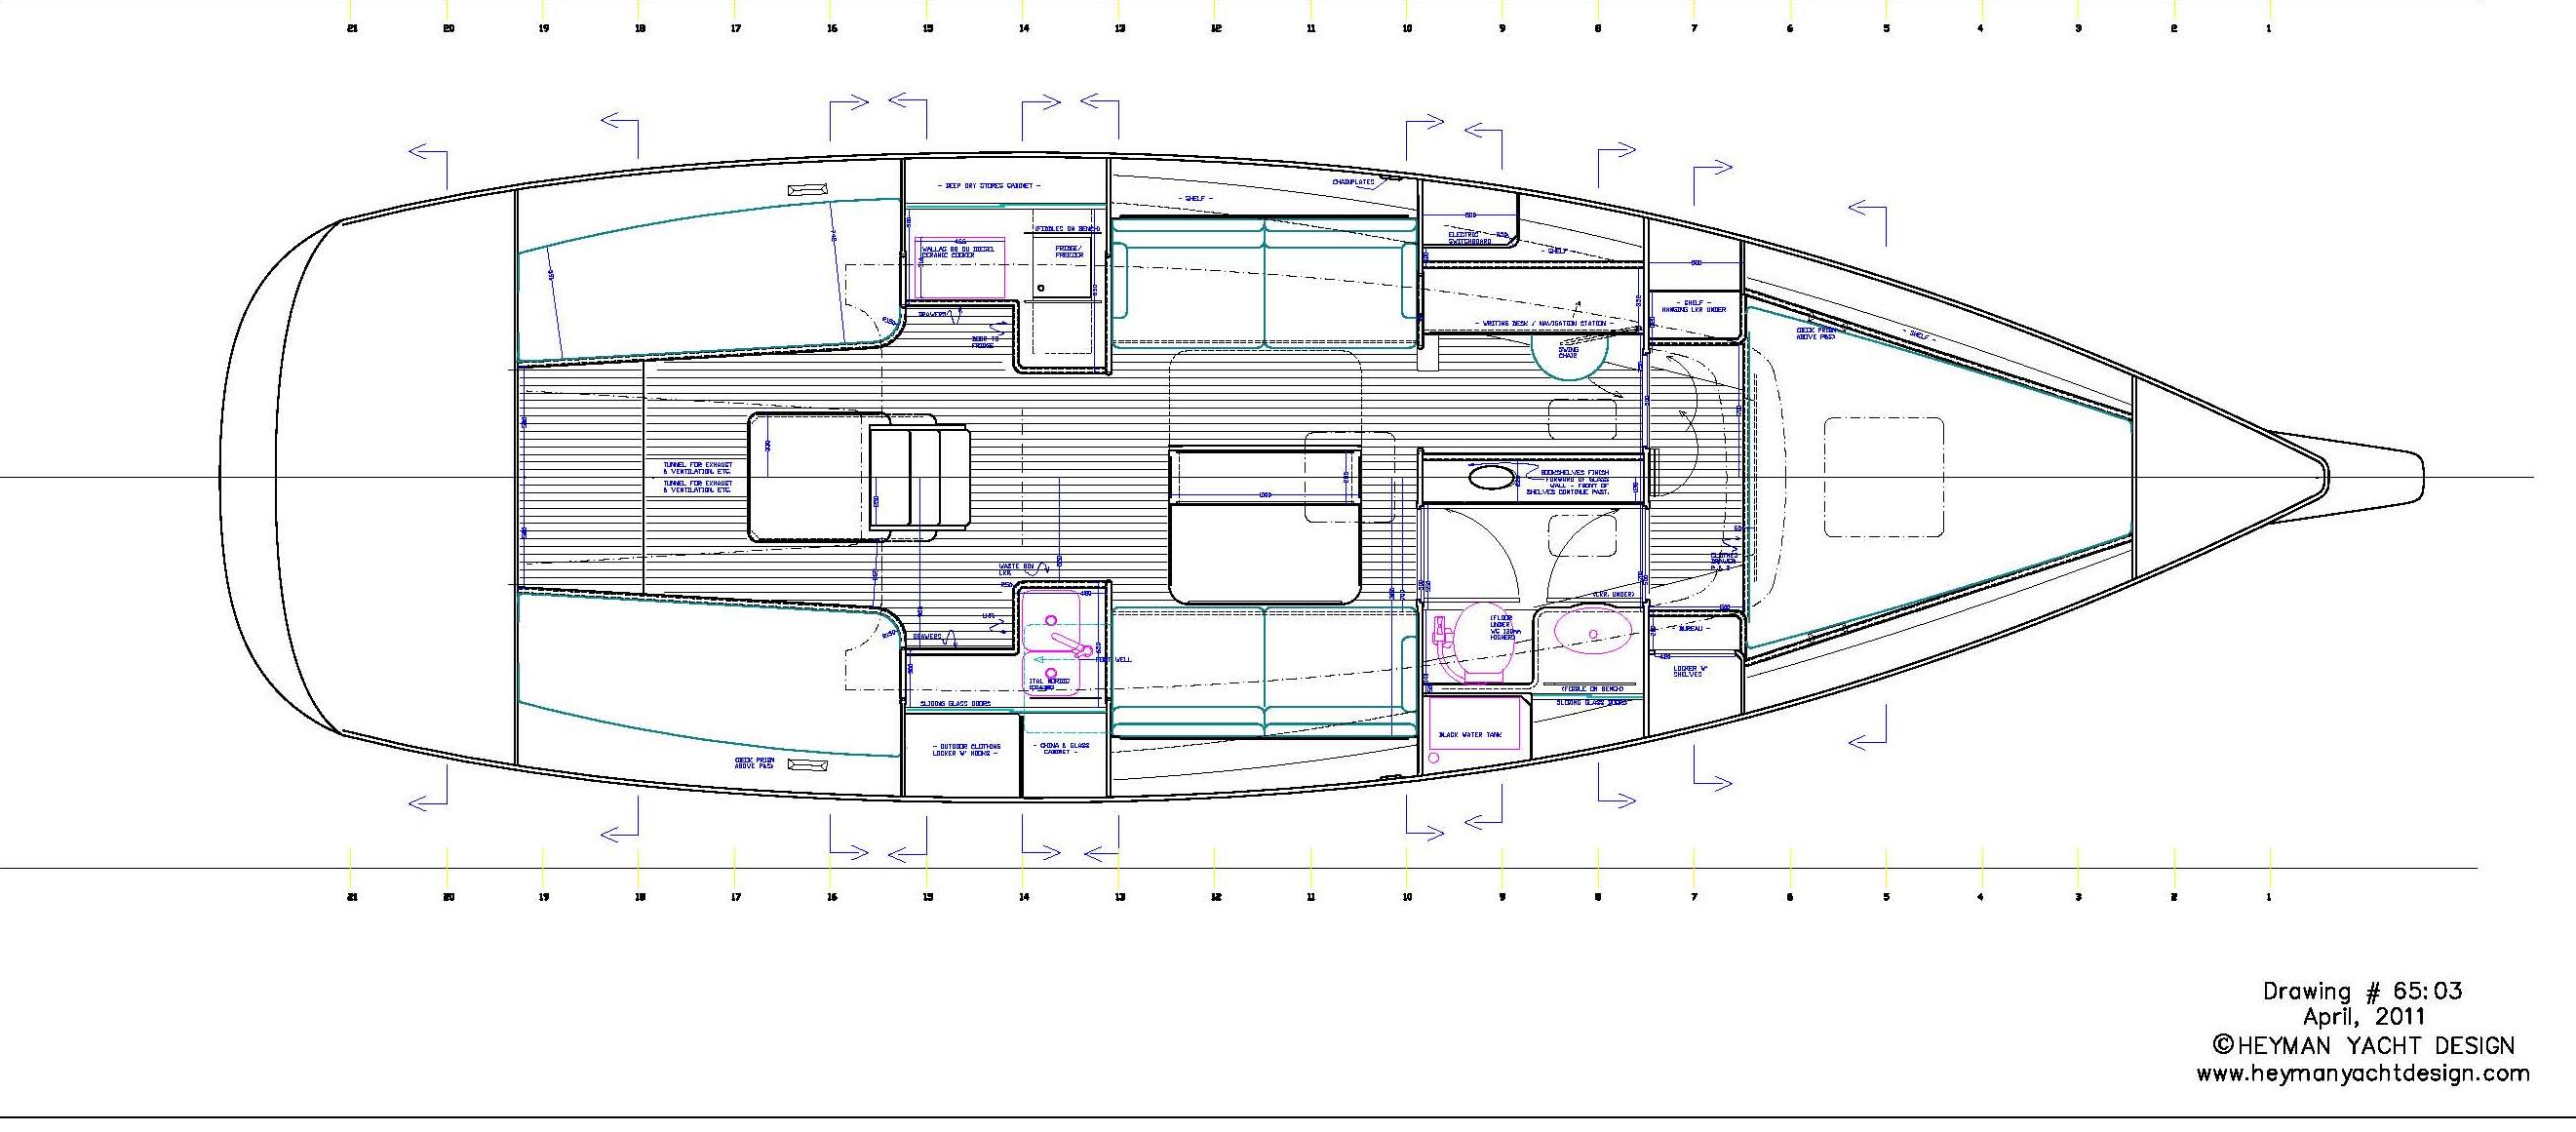 Celeste 36 interior layout